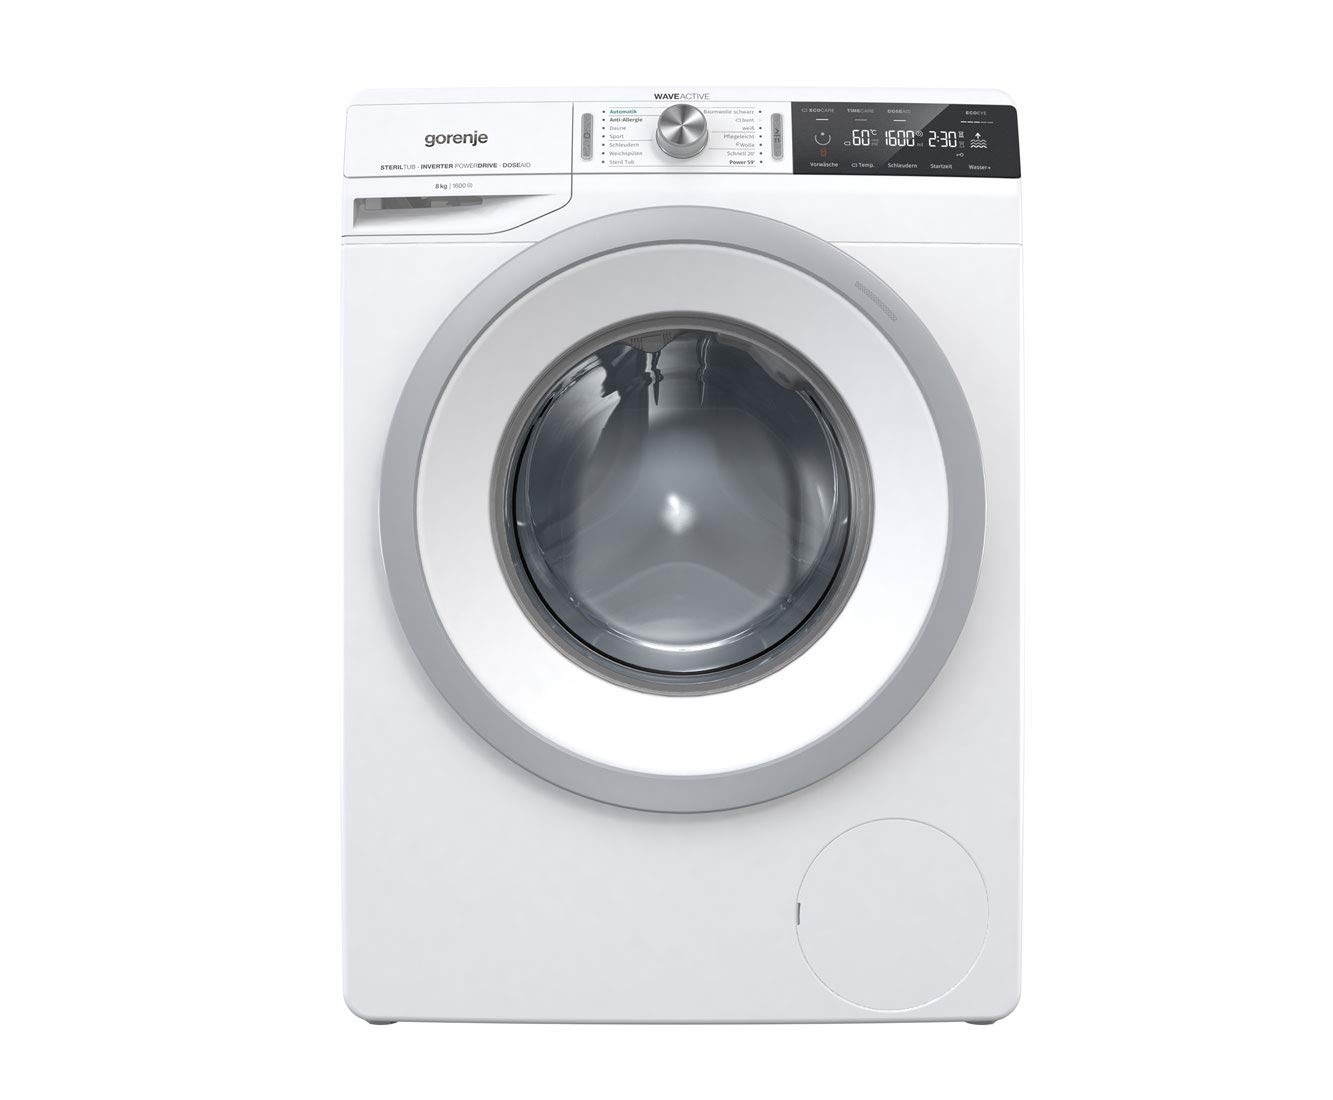 gorenje-WA866T-Waschmaschine-wei